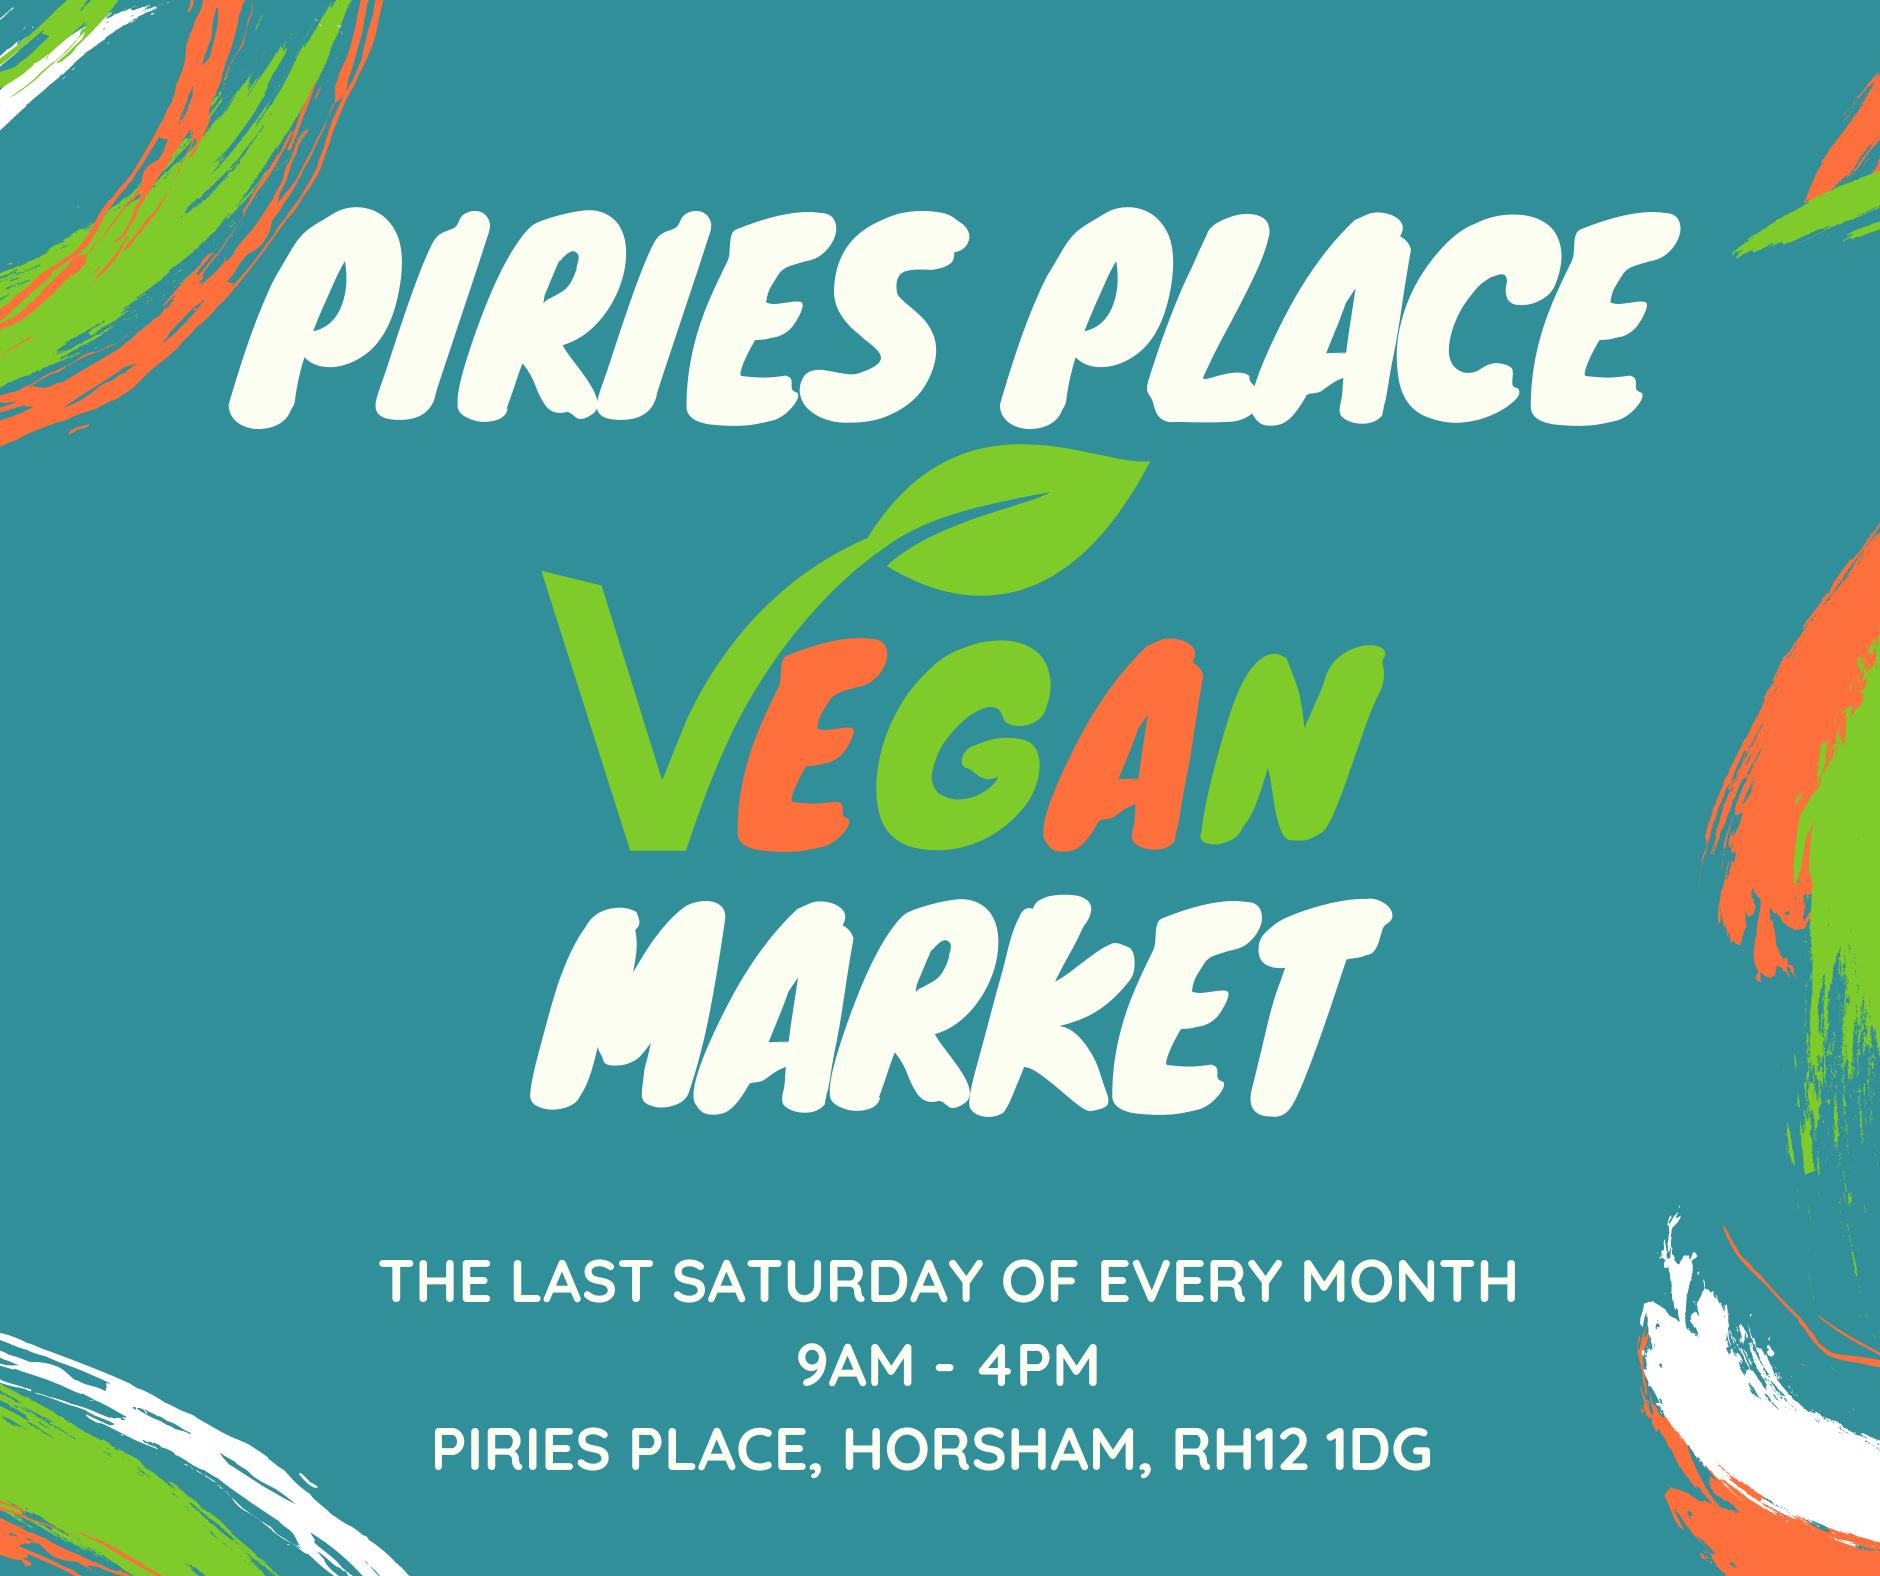 Piries Place Vegan Market